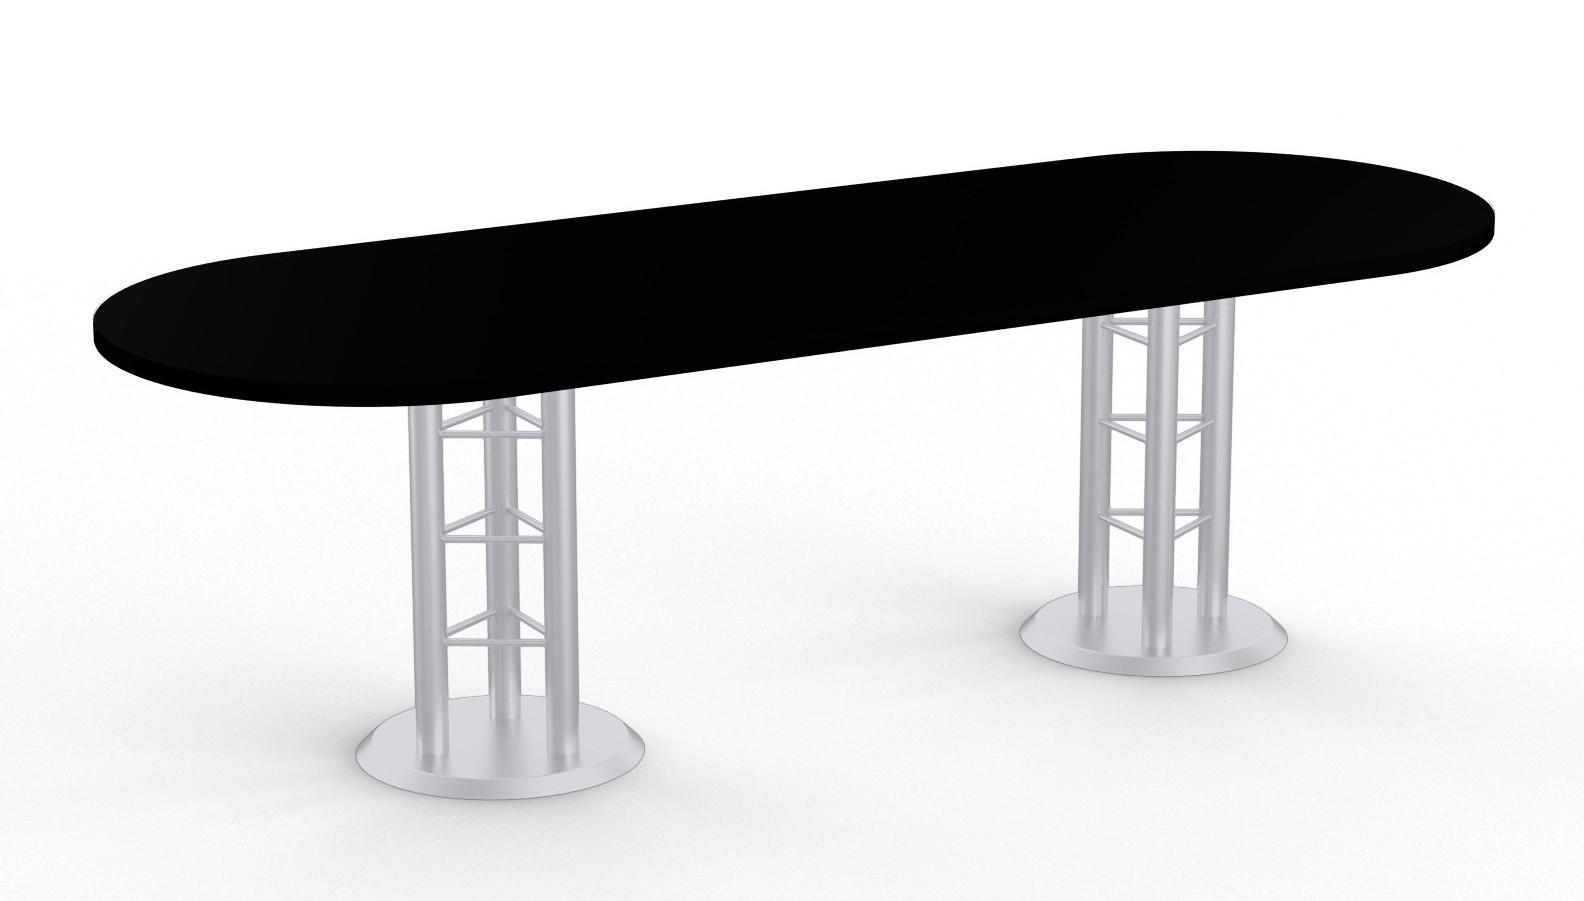 atlantis racetrack conference table - black